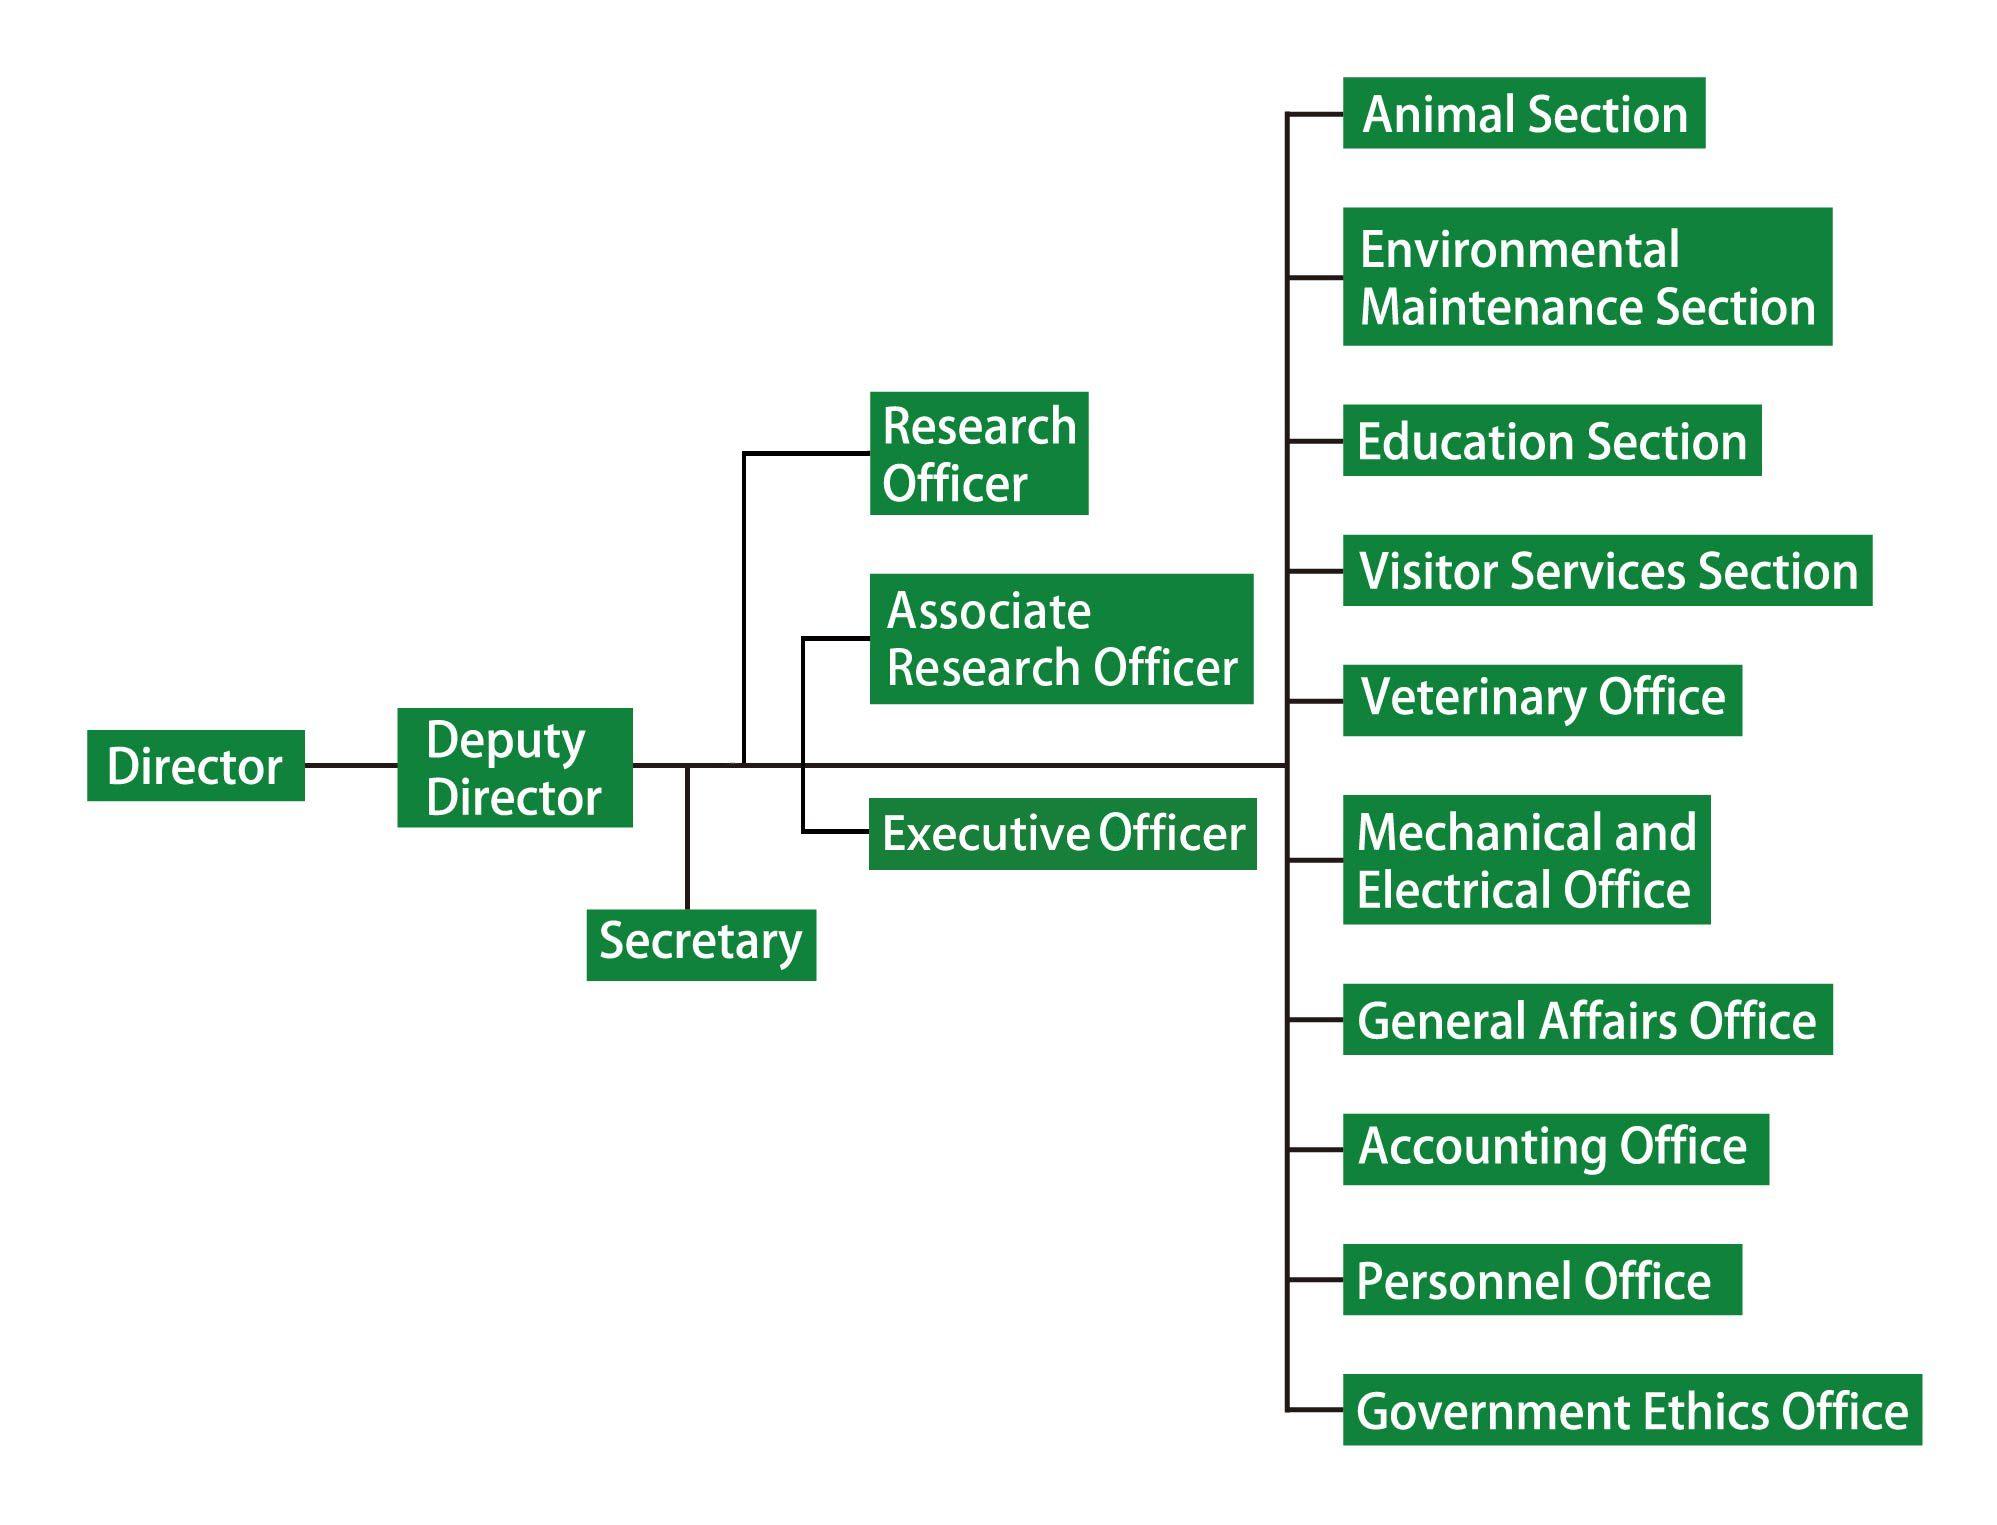 Taipei Zoo Organizational Structure